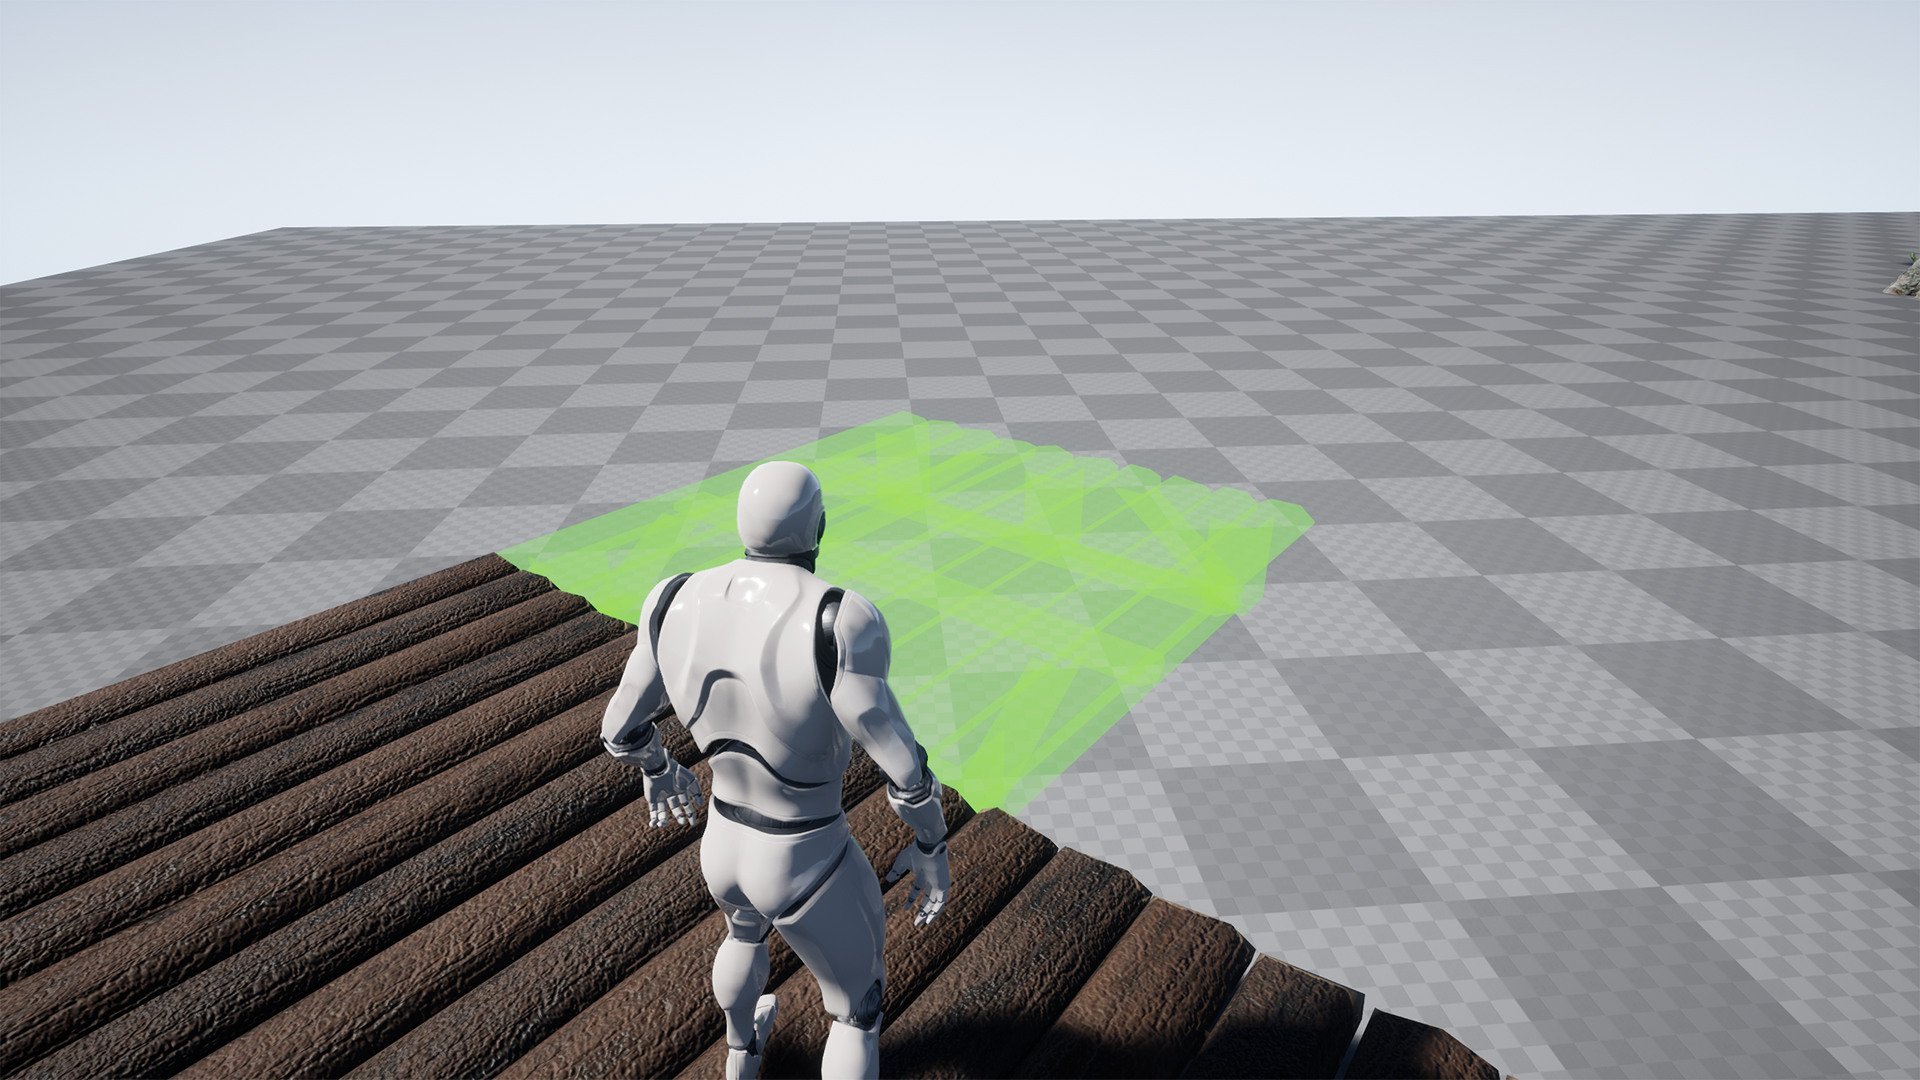 Player Build System v1.7.9 - 虚幻引擎UE4玩家构建系统